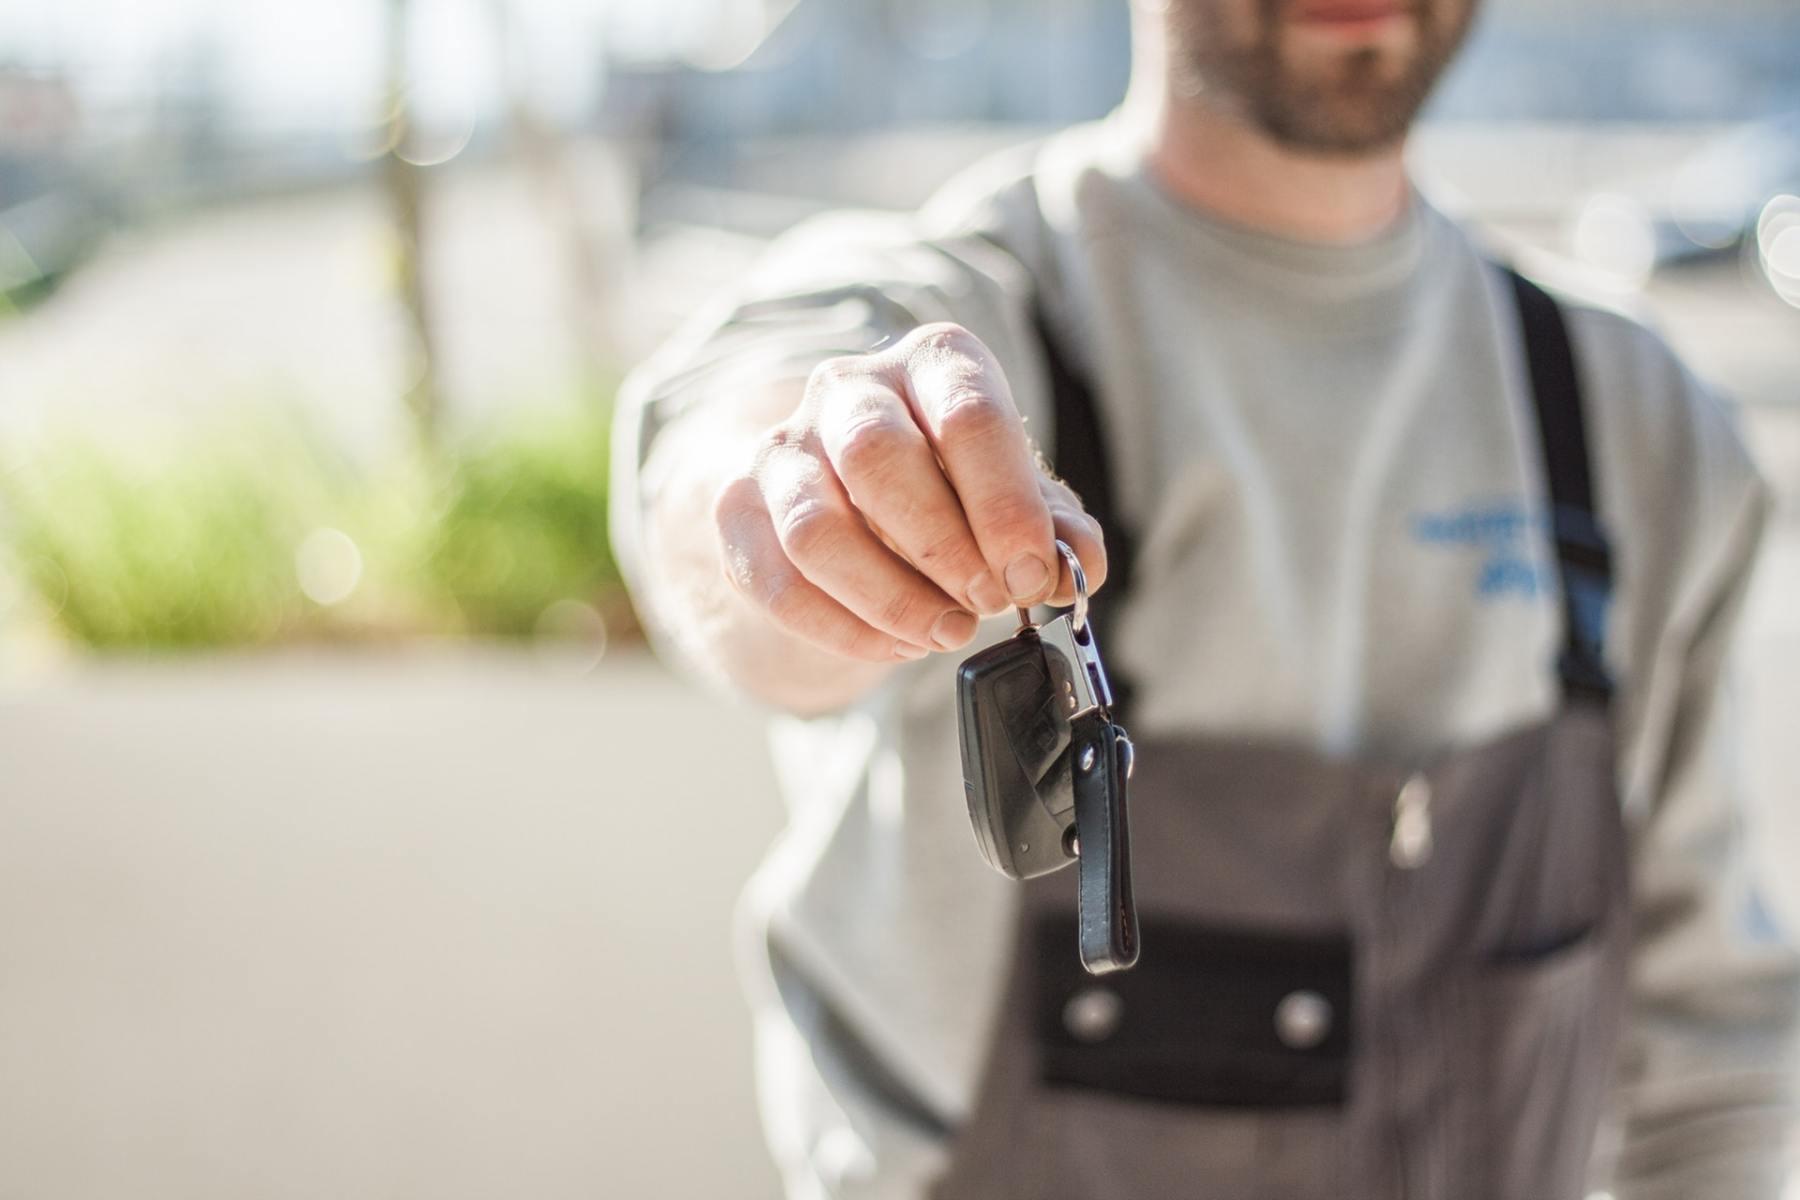 car-driving-keys-repair-97075